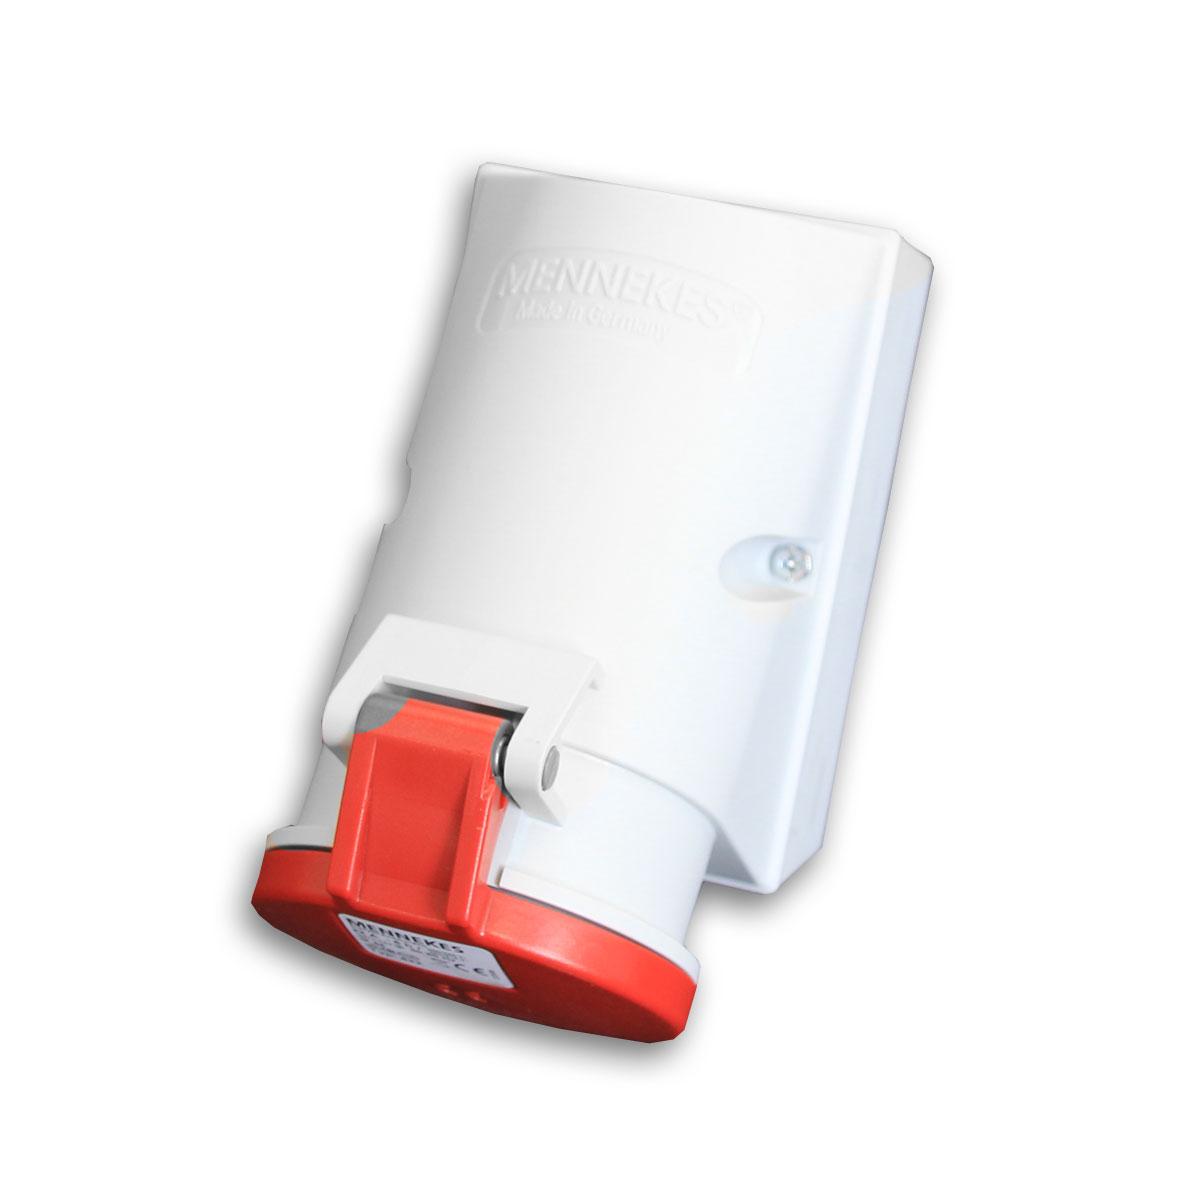 Wandsteckdose mit TwinCONTACT® 32A 5-polig 6h 400V IP44 - Mennekes 422